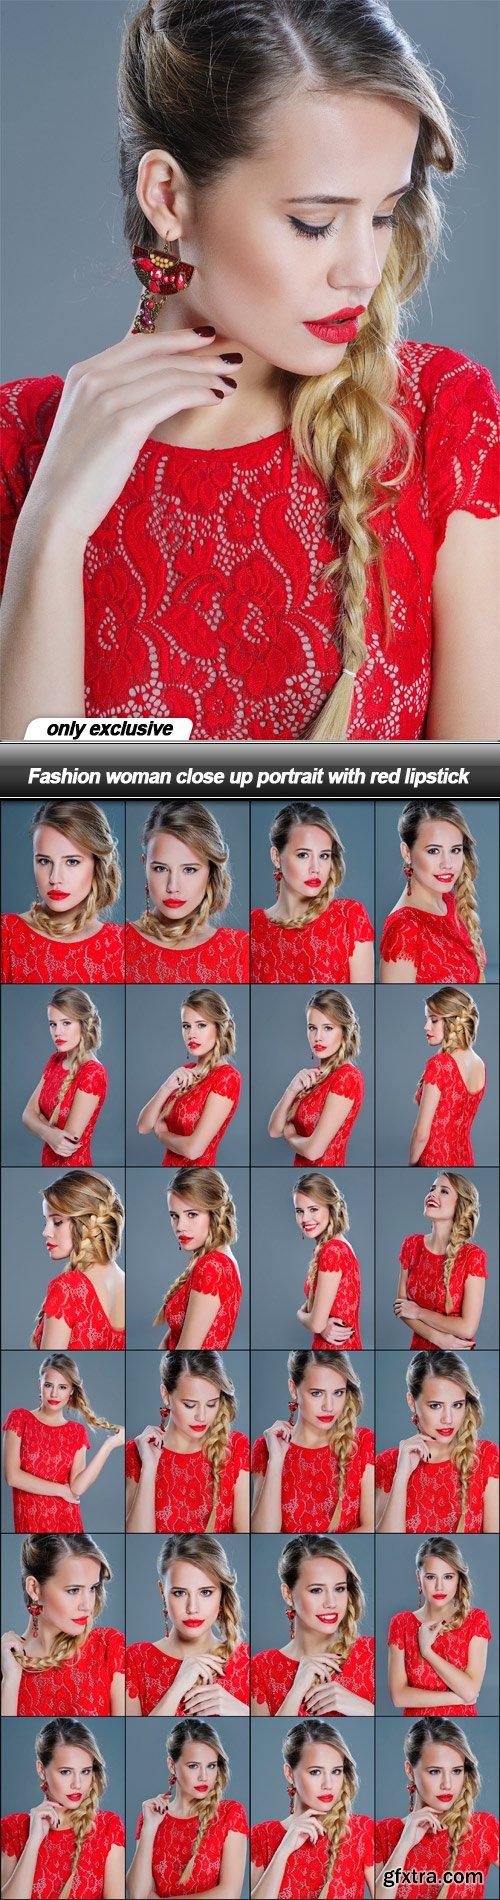 Fashion woman close up portrait with red lipstick - 25 UHQ JPEG